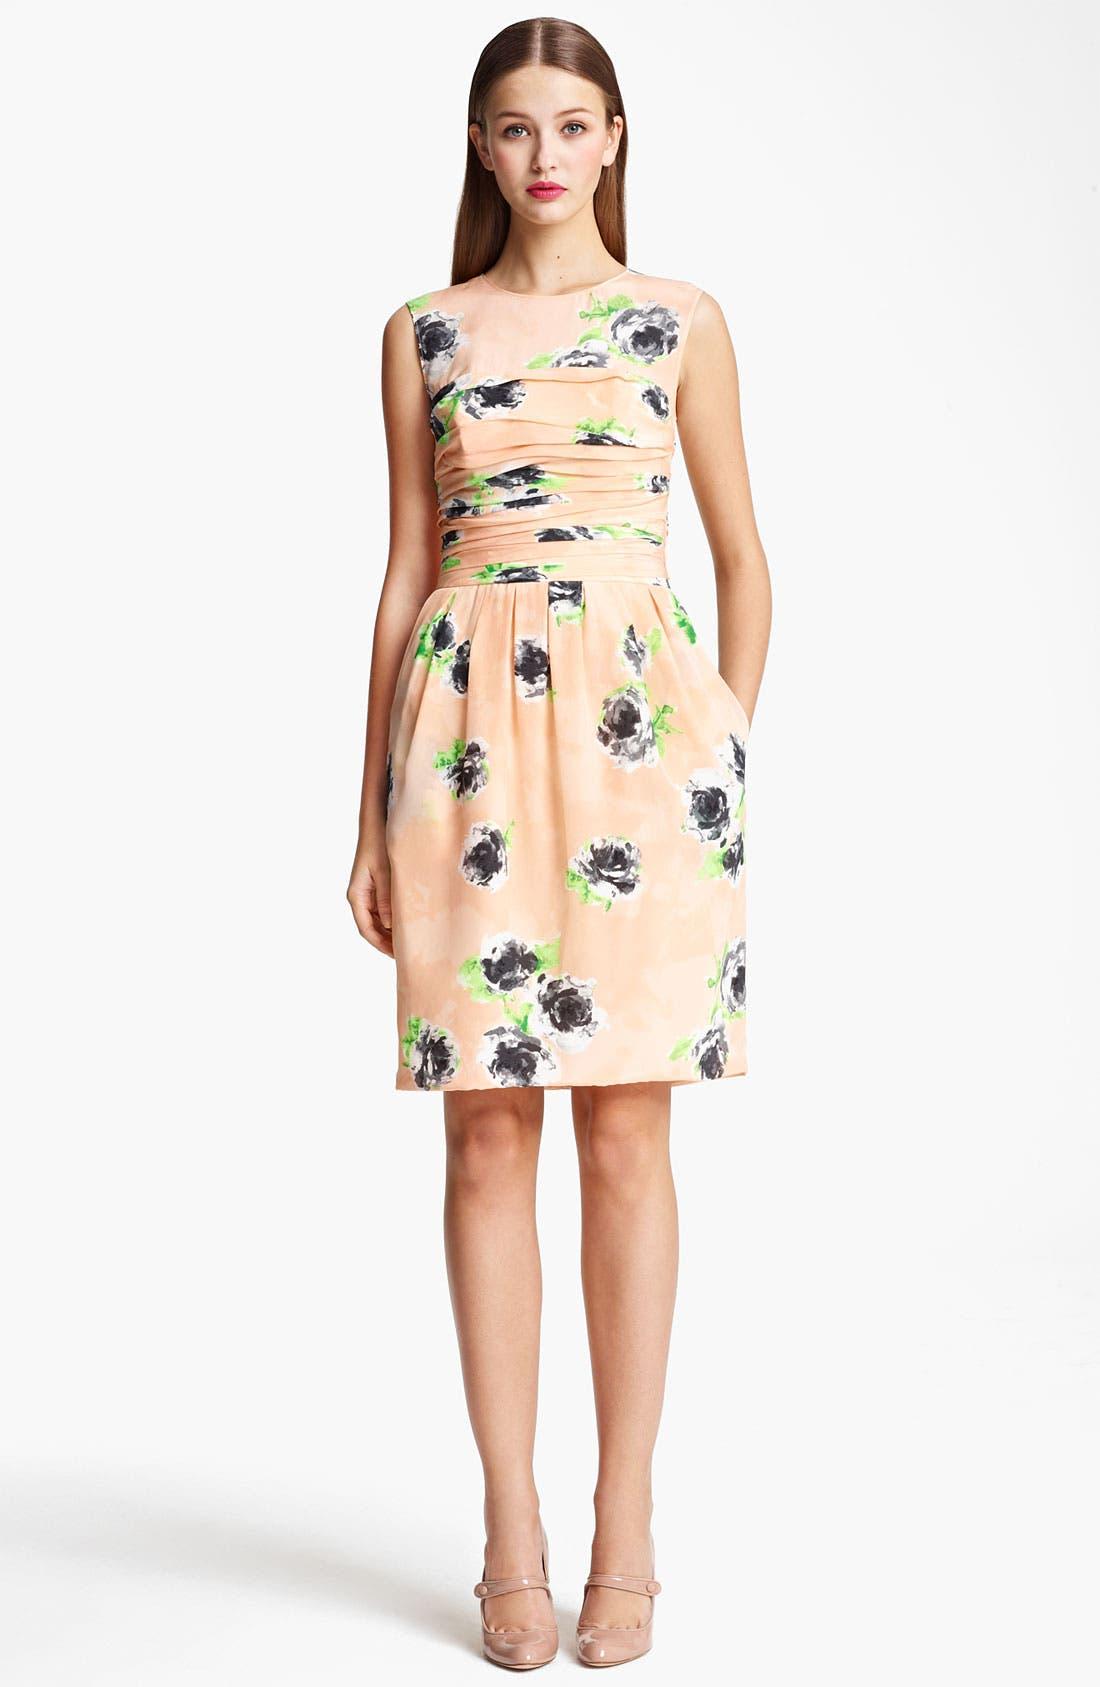 Main Image - Moschino Cheap & Chic Rose Print Crêpe de Chine Dress